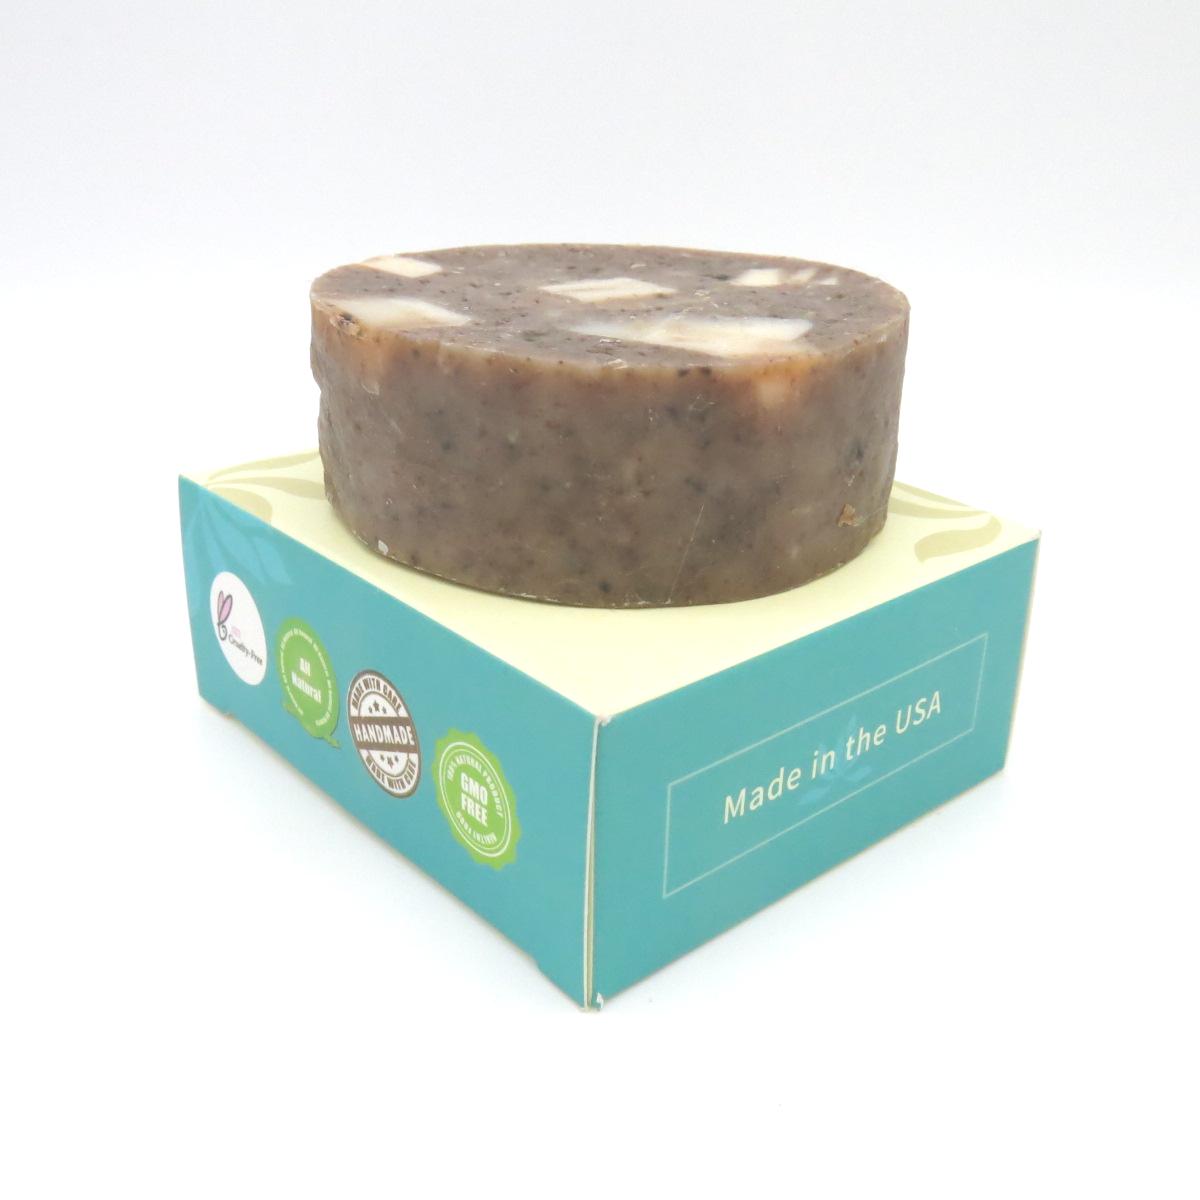 Avocado, Silk Protein, Shouwu and Herbs - Macadamia Max Oil Control Shampoo Bar